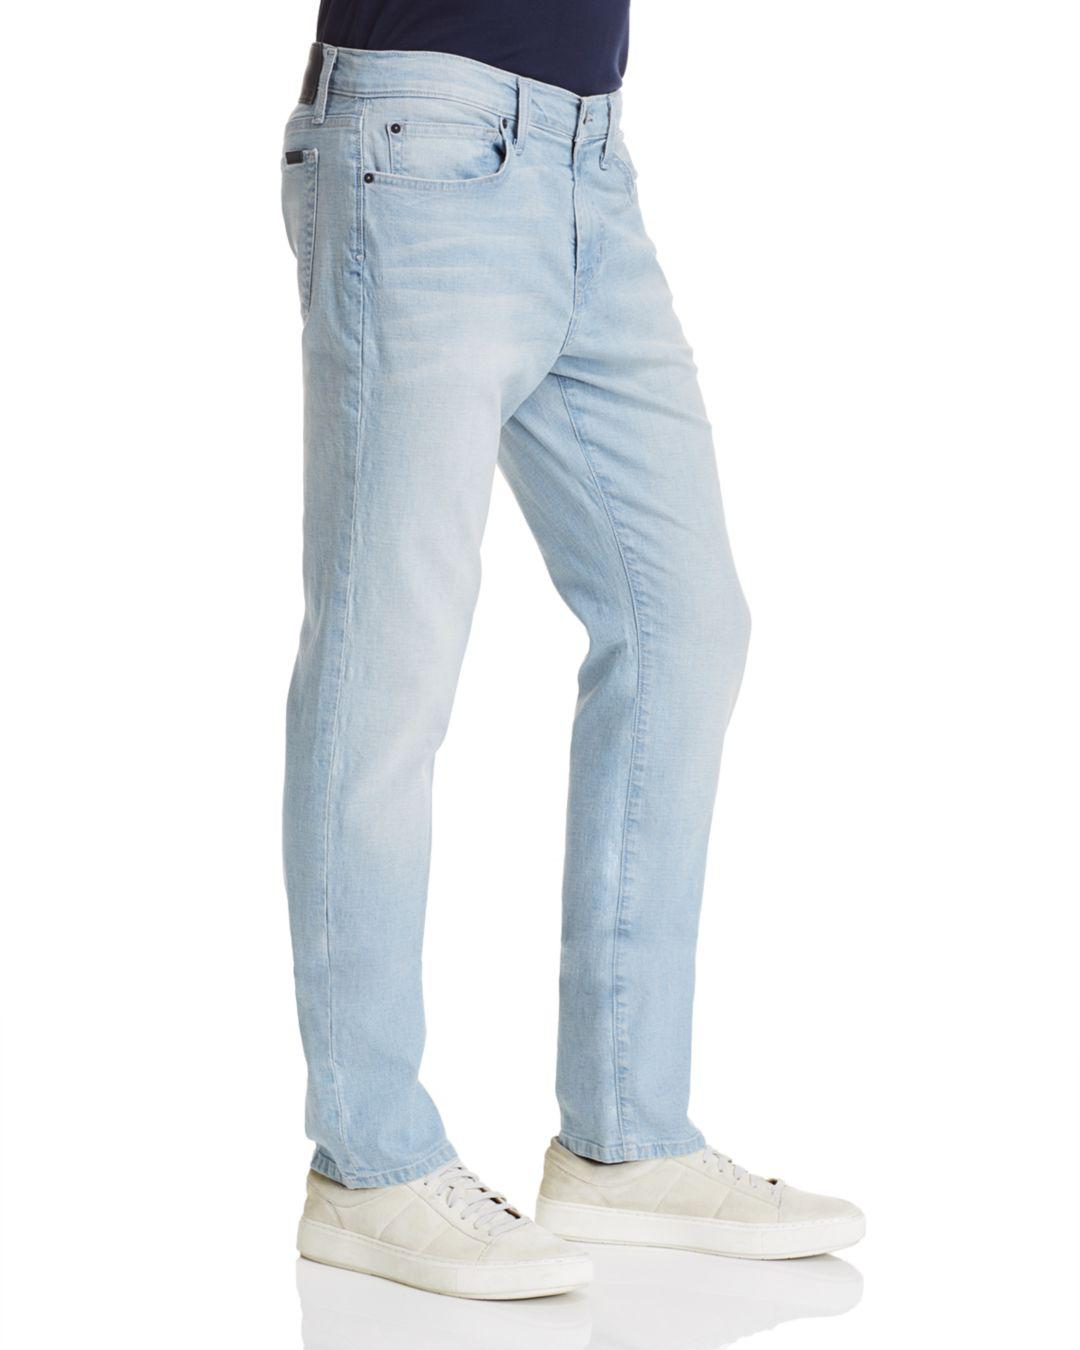 Joe's Jeans Denim Brewster Slim Fit Jeans In Light Indigo in Blue for Men